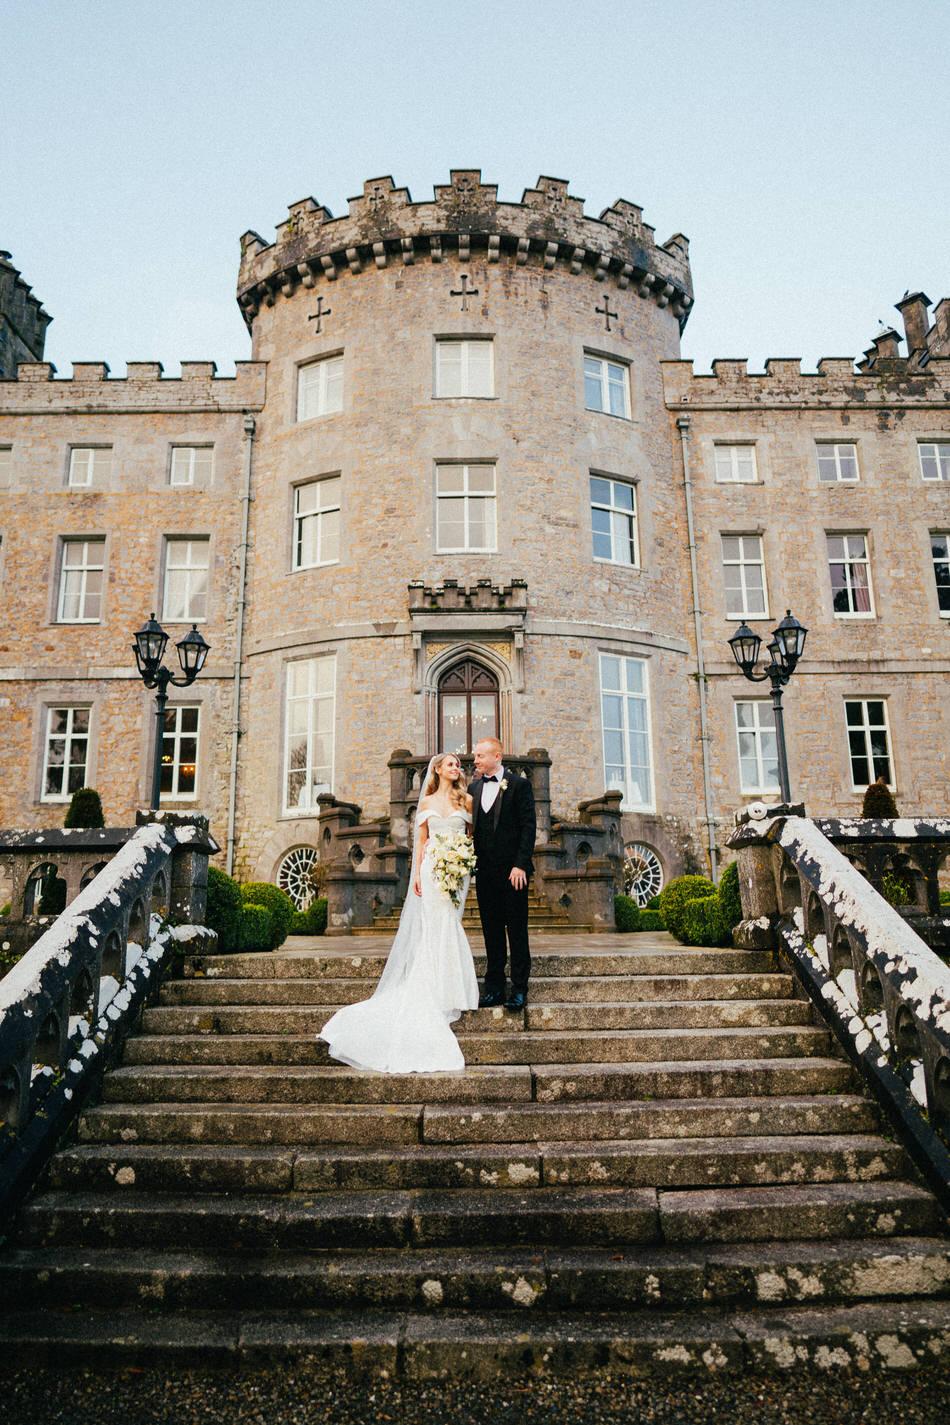 Castle-wedding-ireland-photos- 0185 131